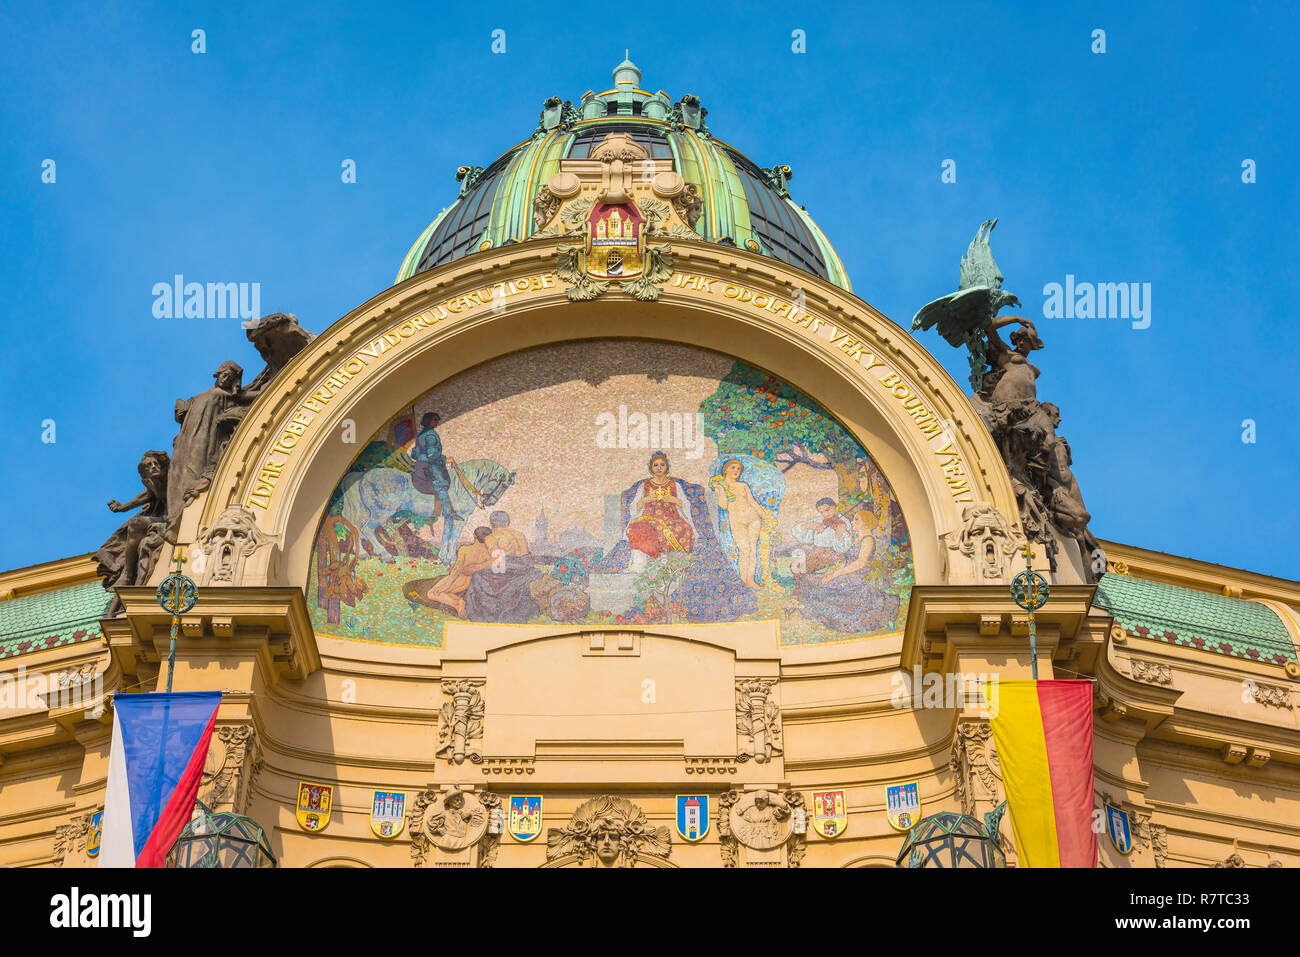 Art nouveau Prague, view of a colorful mosaic along the roofline of the art nouveau styled Obecni dum (Municipal House) building in Prague, Czech Rep. Stock Photo